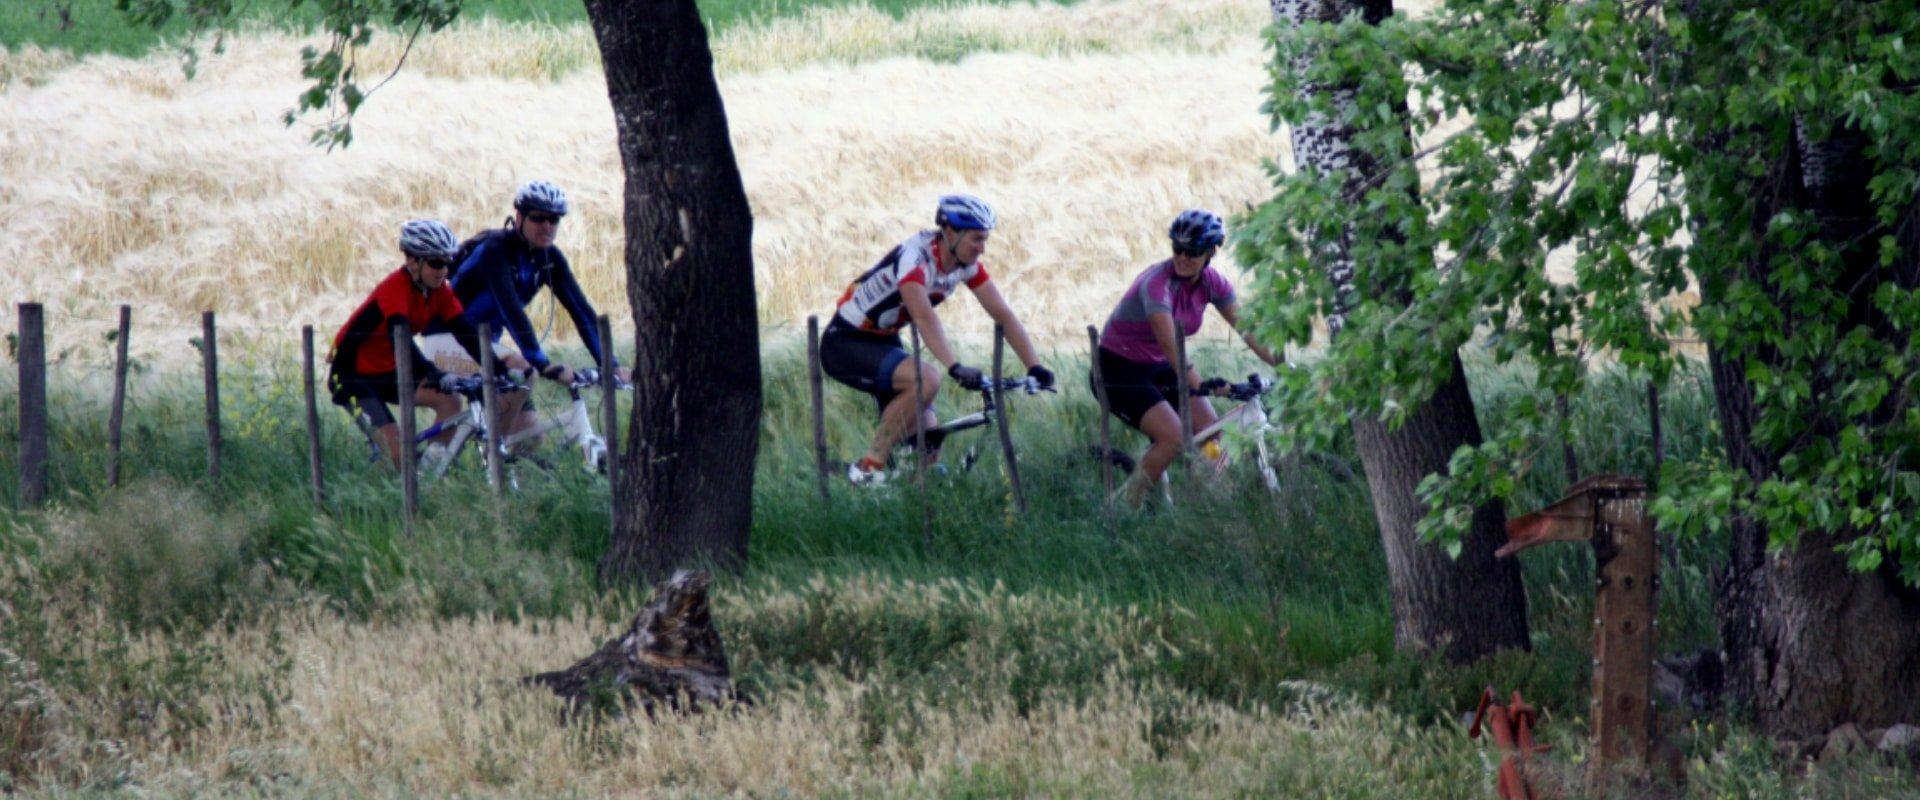 Ride a mountain bike through the countryside